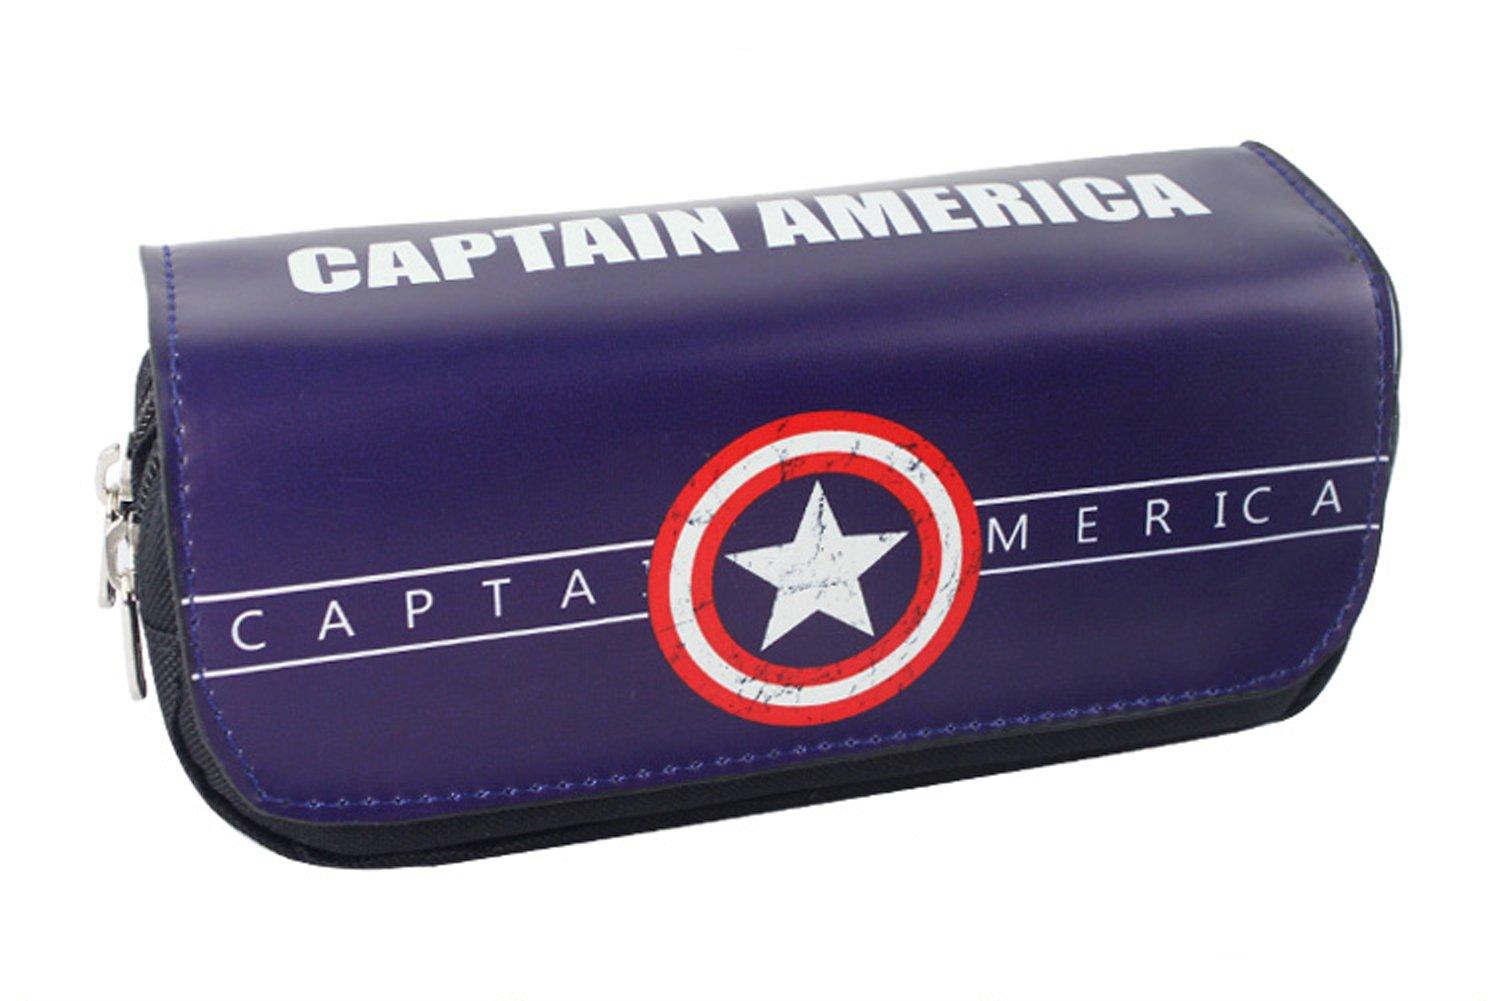 YOURNELO Super Heroes Pencil Bag Pen Case Multi-Functional Pouch Zipper Bag for Pens Pencils Holder (Captain America)